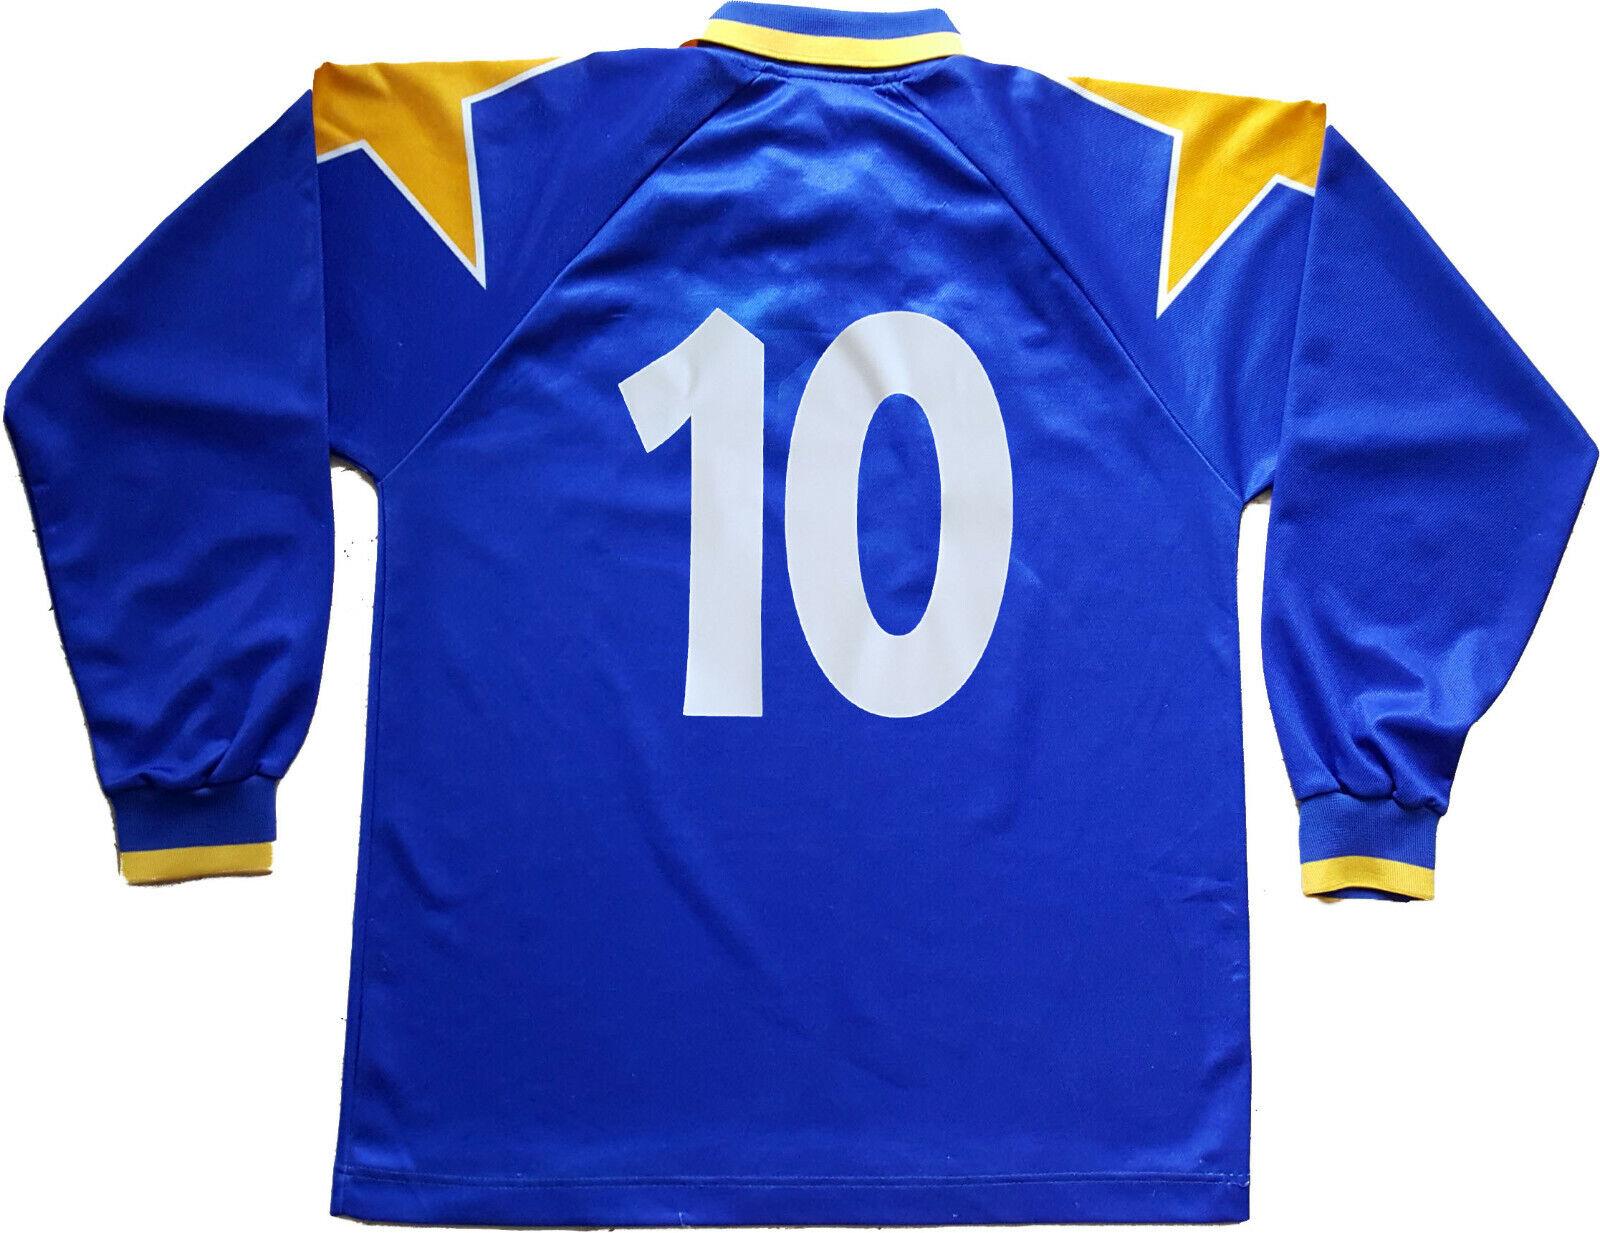 Maglia juventus Baggio Del Piero Kappa 1994-95 M Champions UCL  jersey vintage